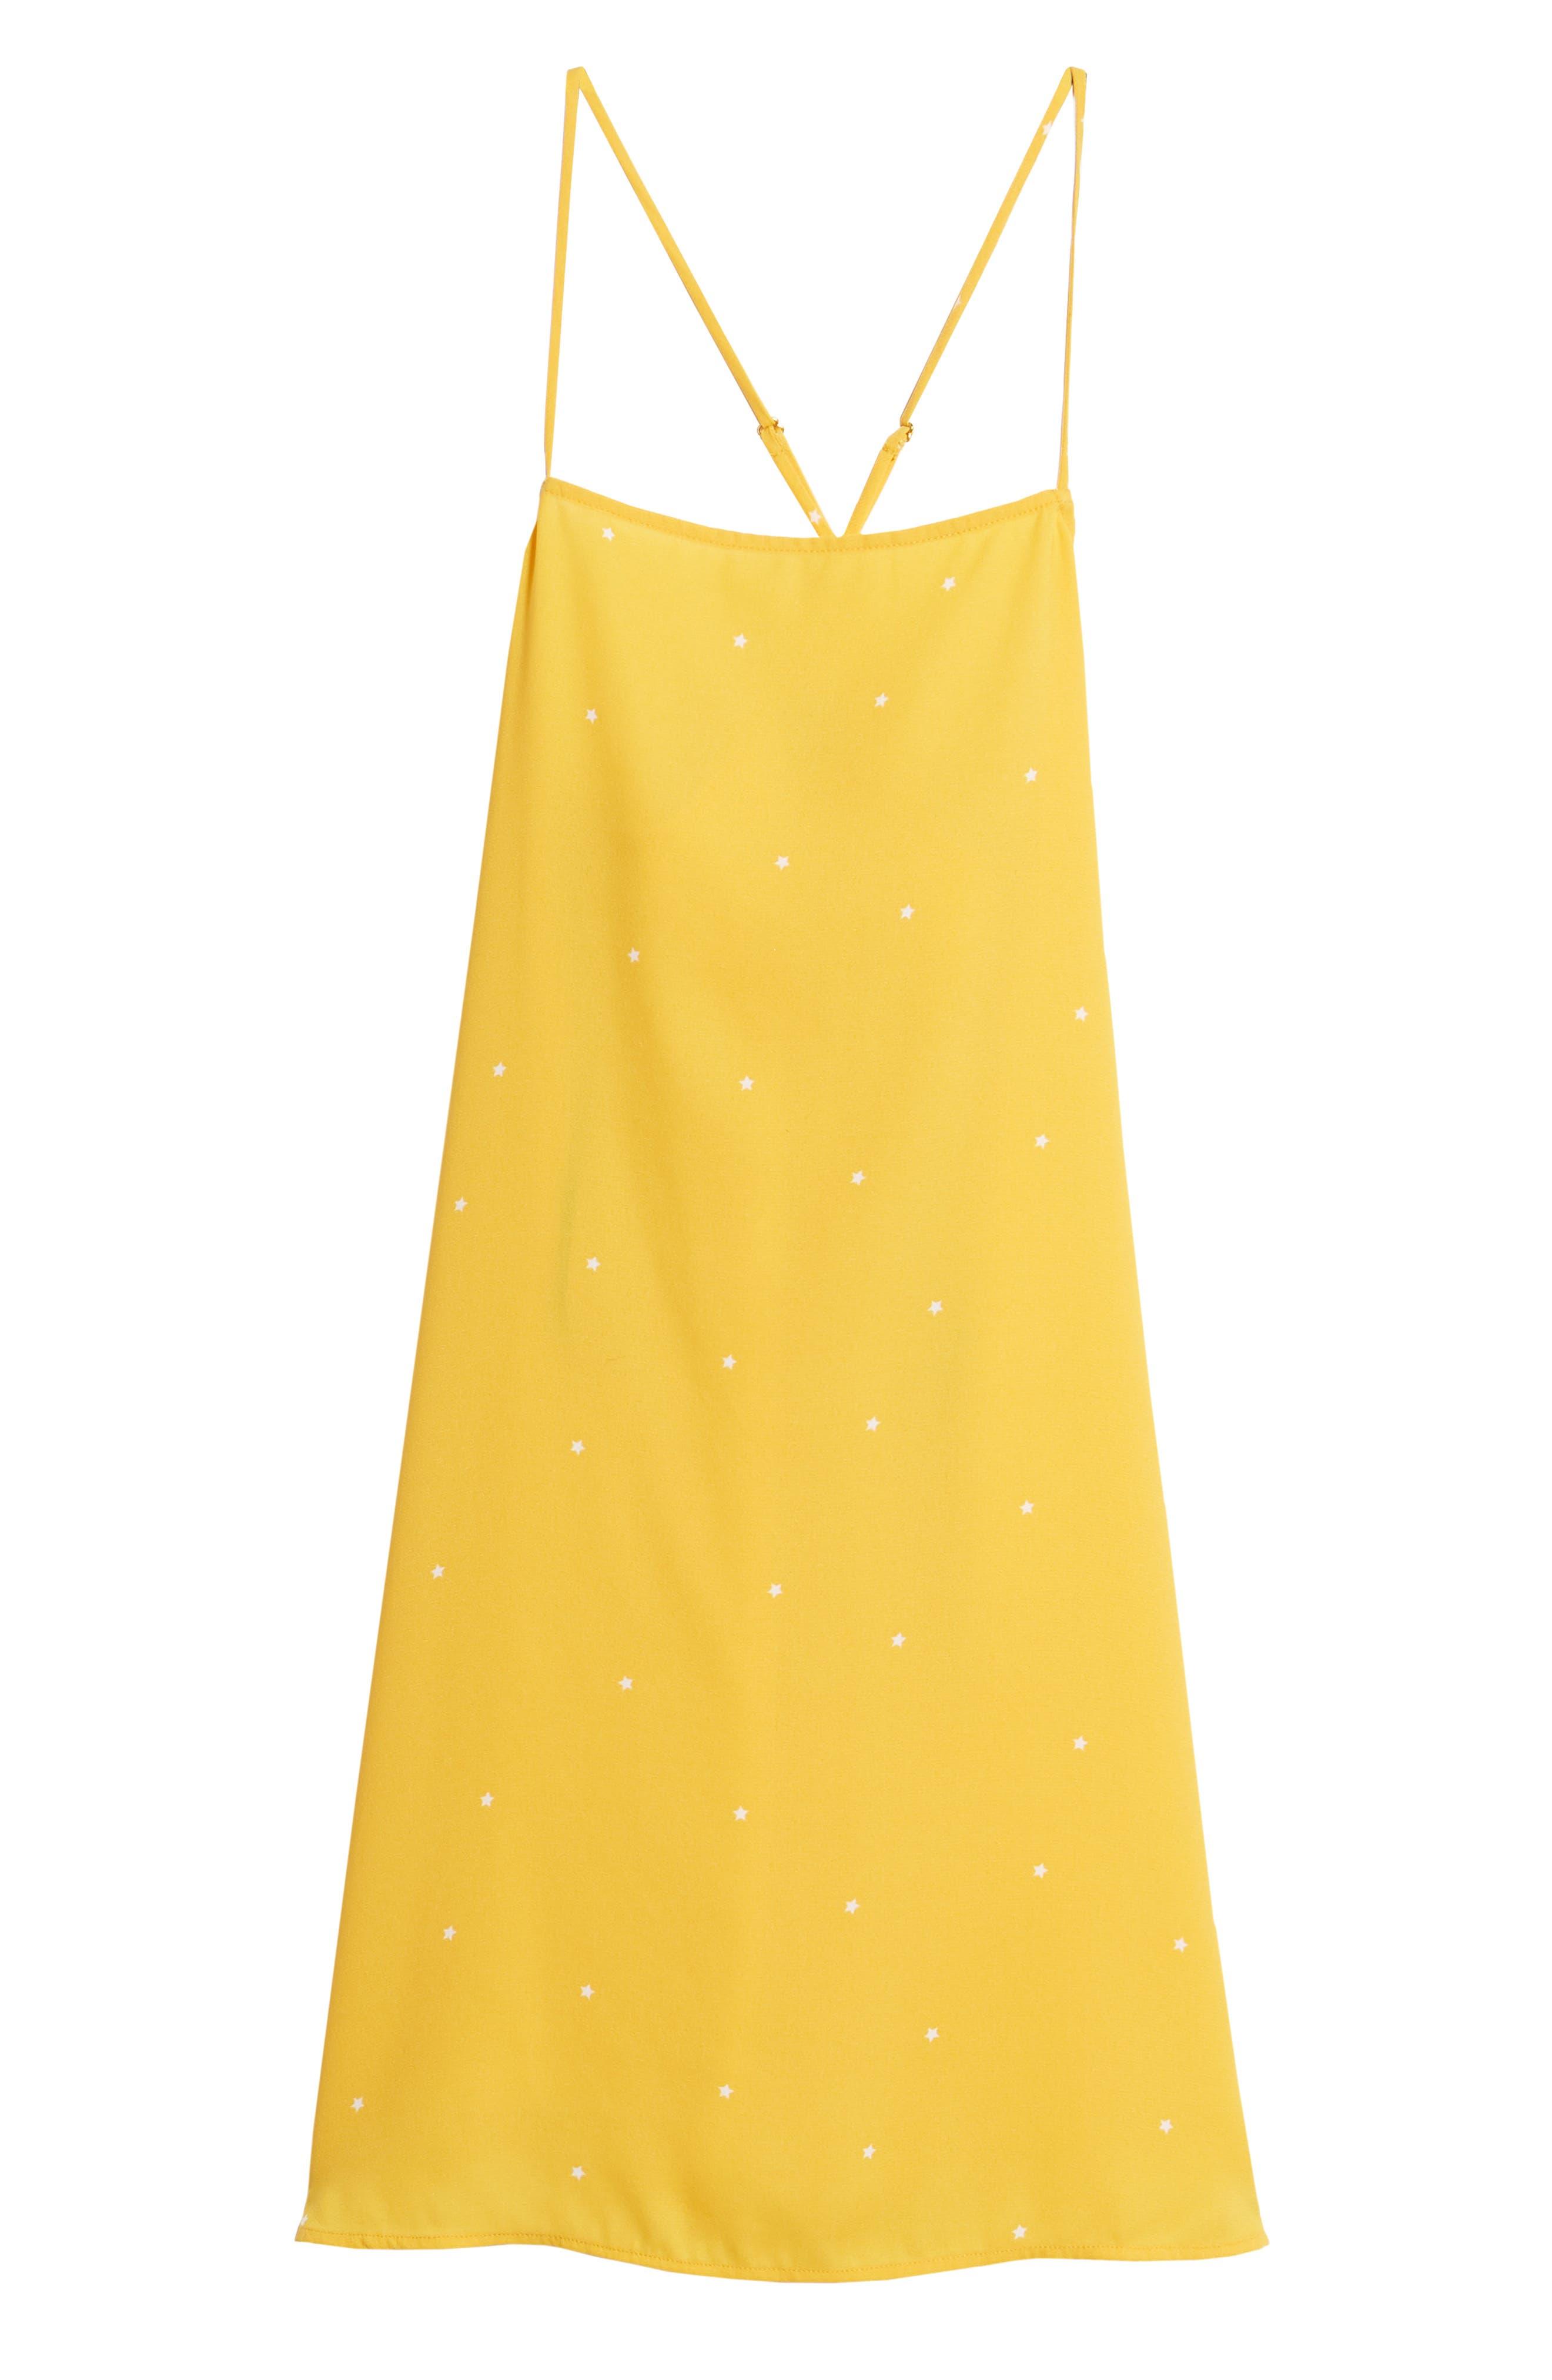 Mental 4 Metal Star Print Dress,                             Alternate thumbnail 7, color,                             Citrus Gold